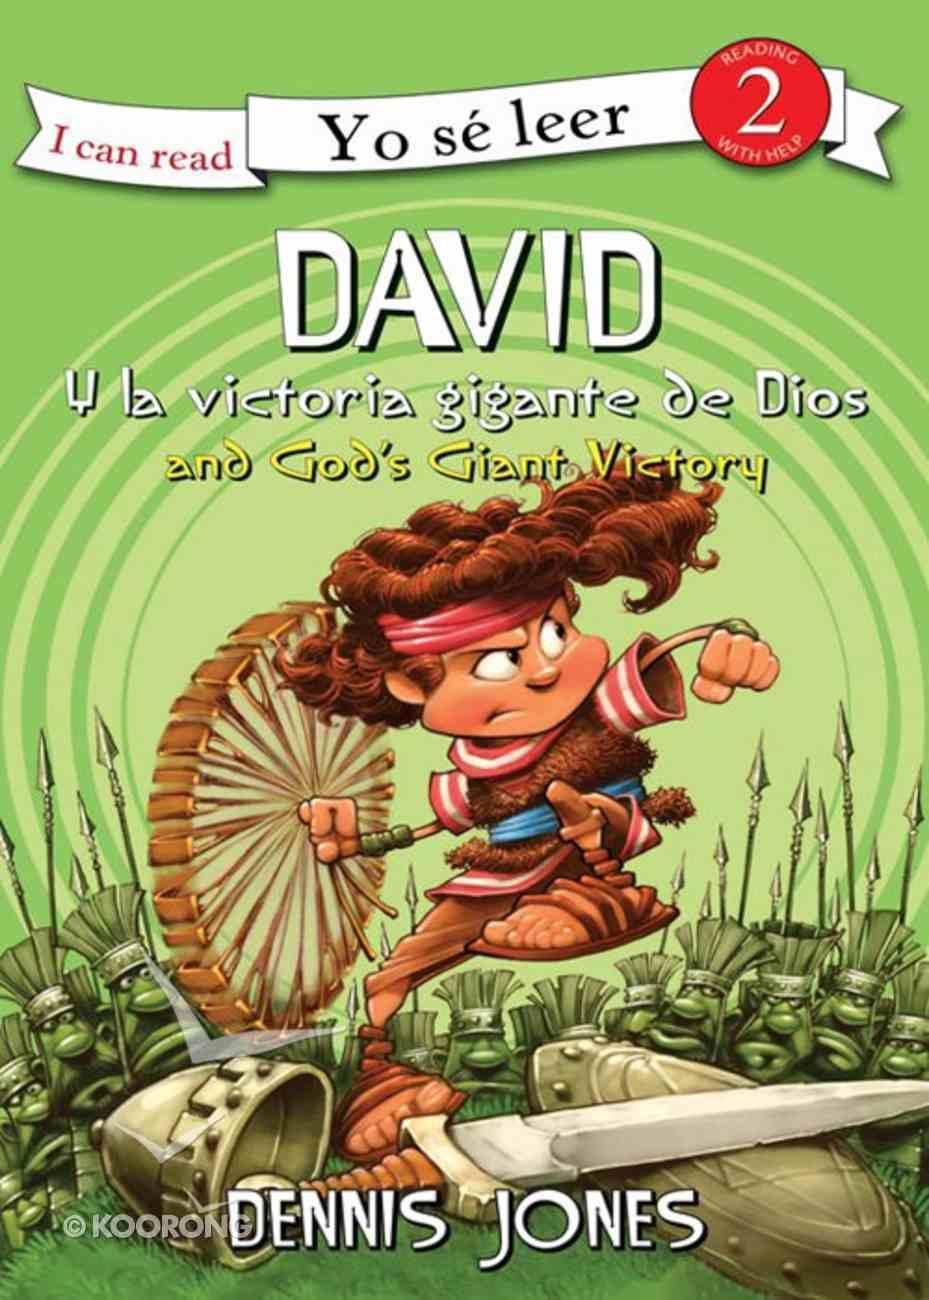 David Y La Victoria Gigante De Dios (Spa) (David and God's Giant Victory) (I Can Read!2/biblical Values Series) eBook